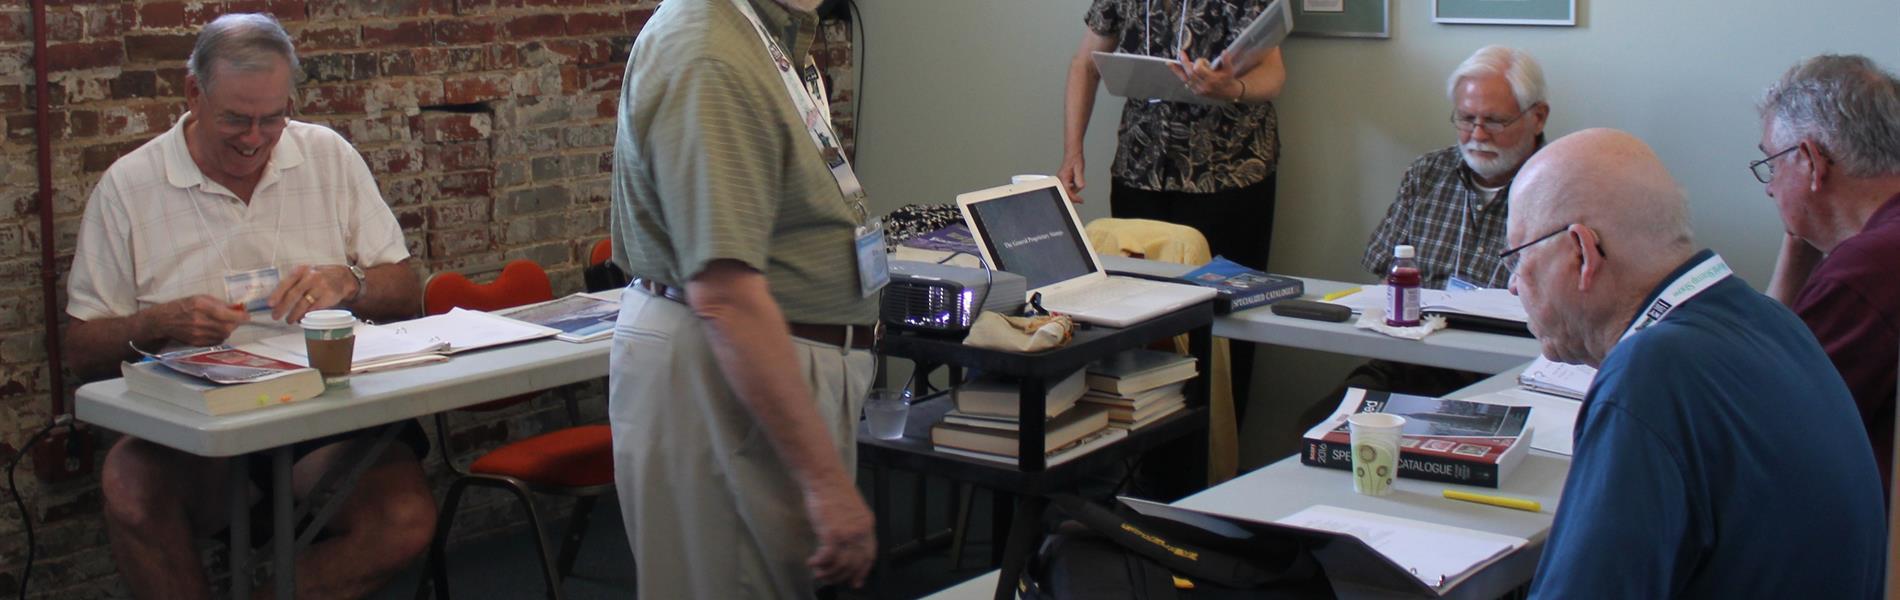 revenue-stamp-expert-ron-lesher-addresses-seminar-participants